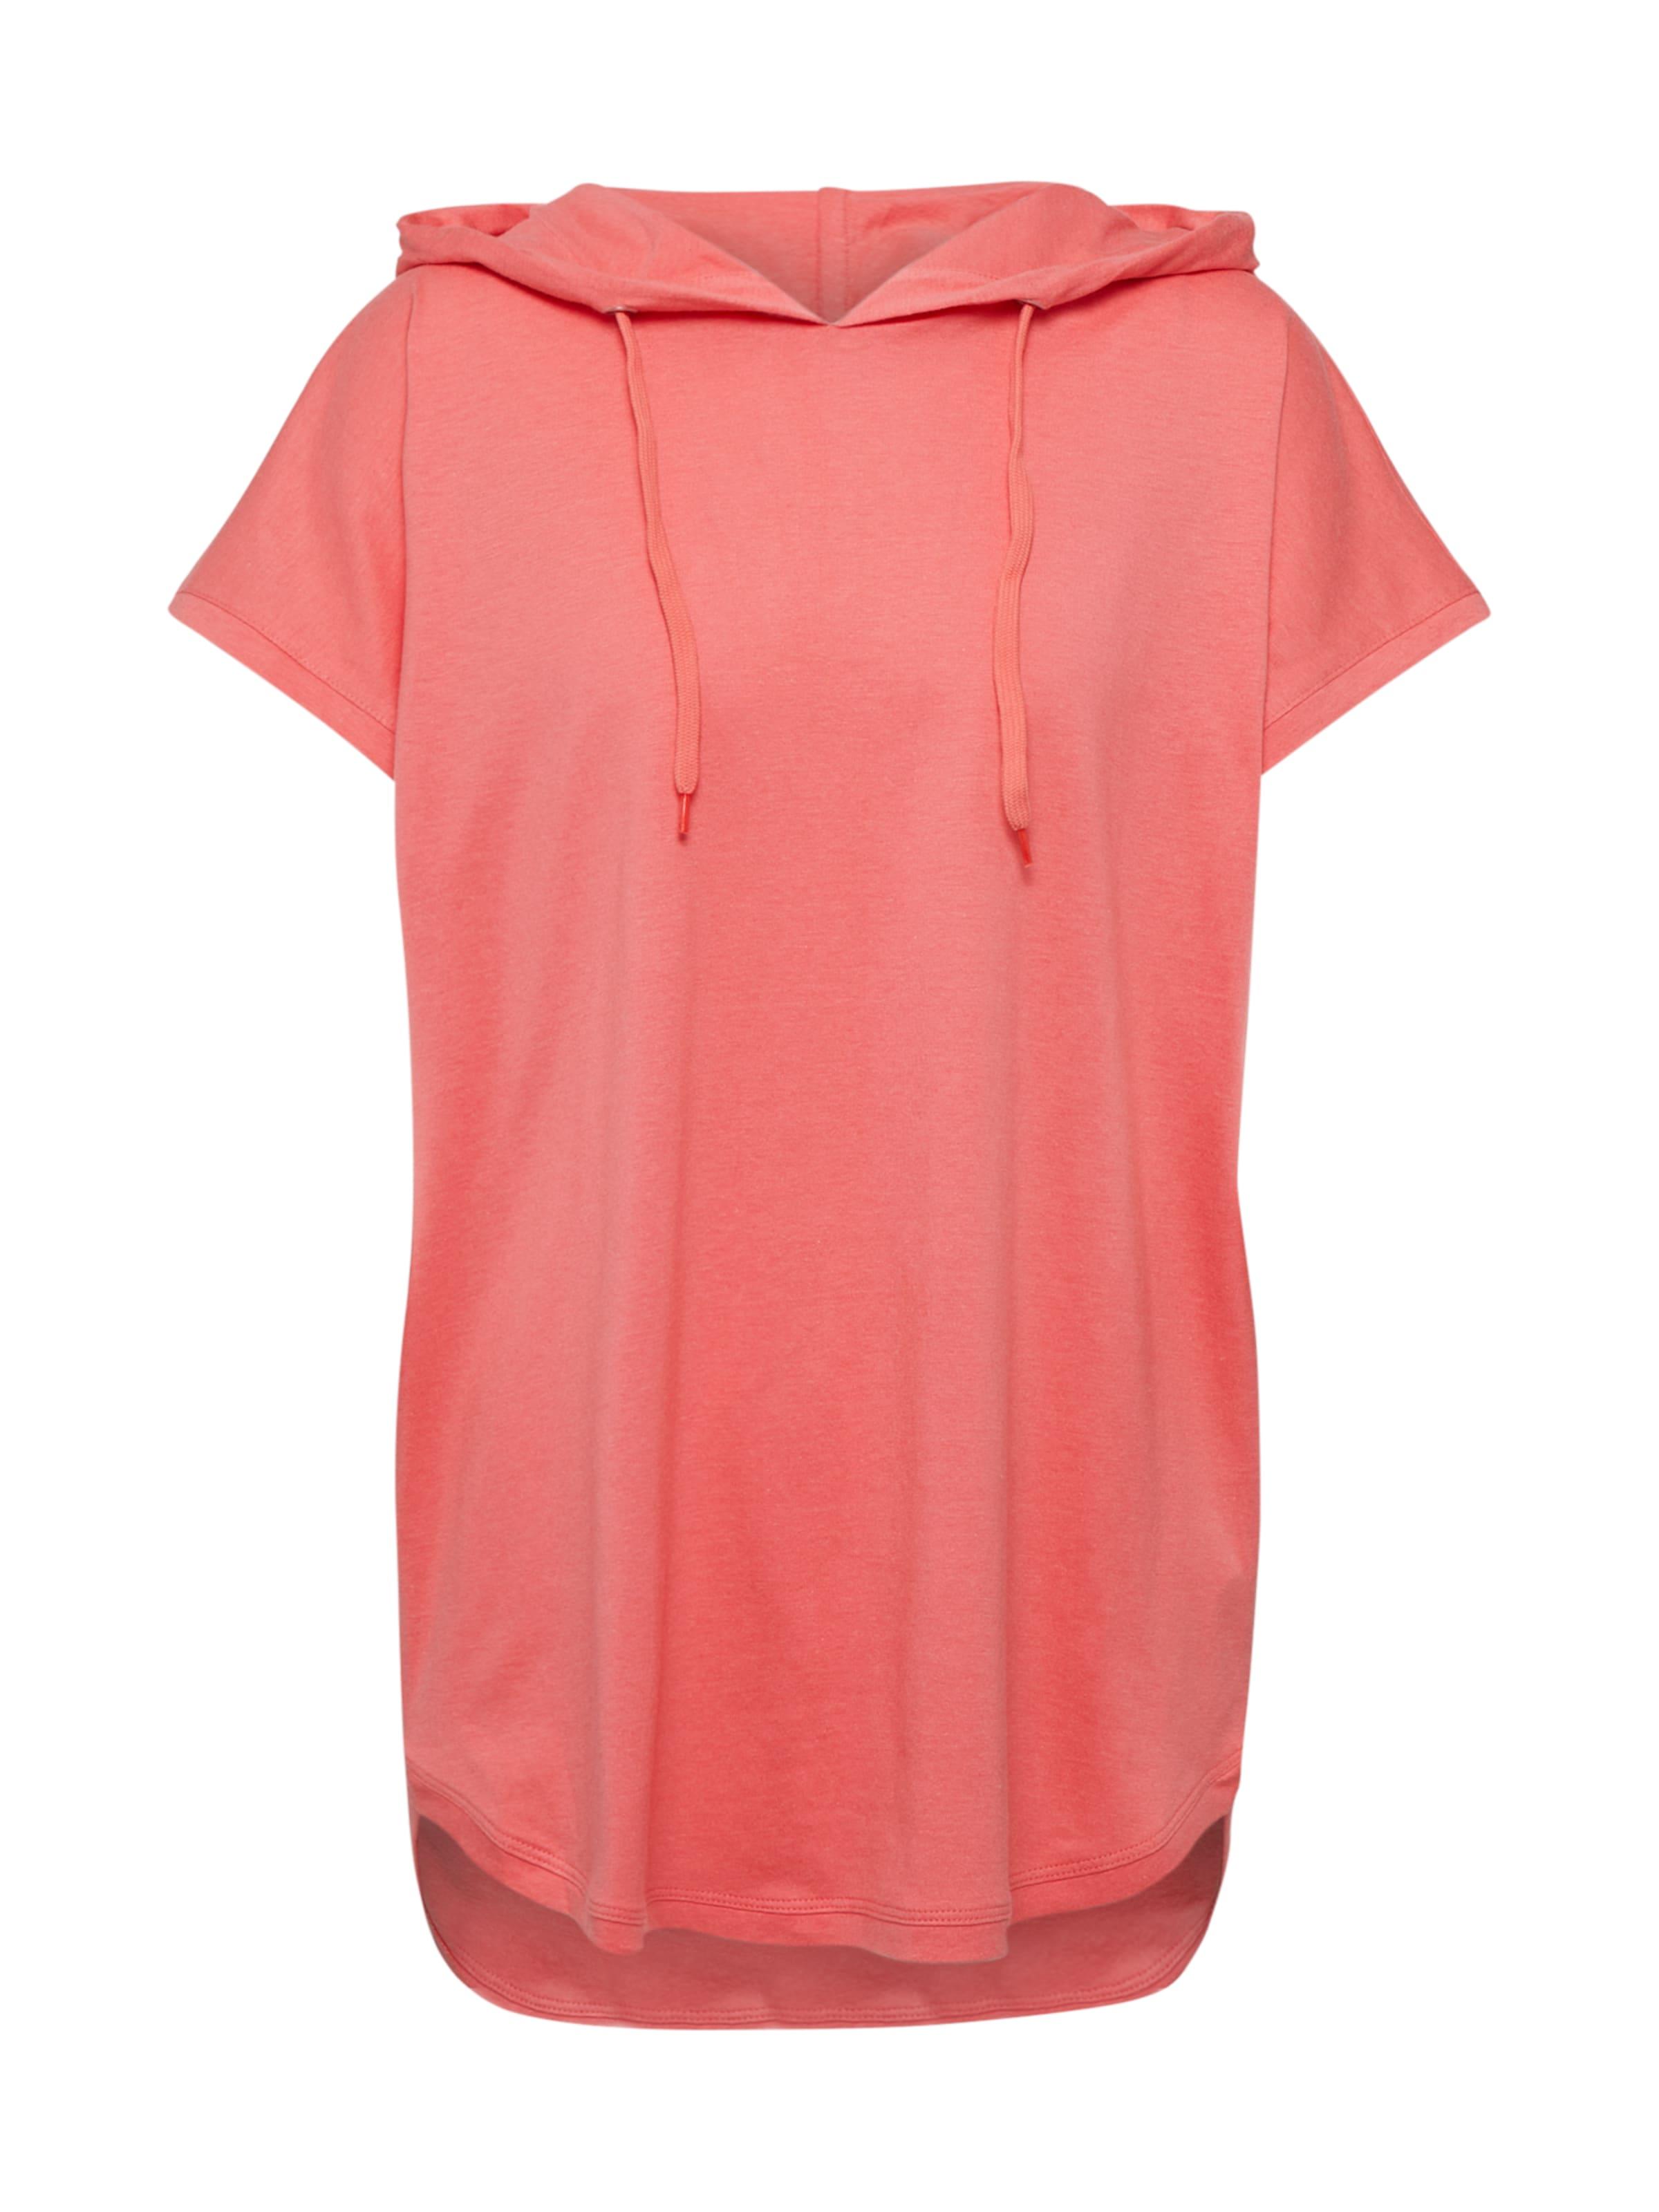 Urban Oversize Classics T Blanc Curvy shirt En iOkuTPXZ